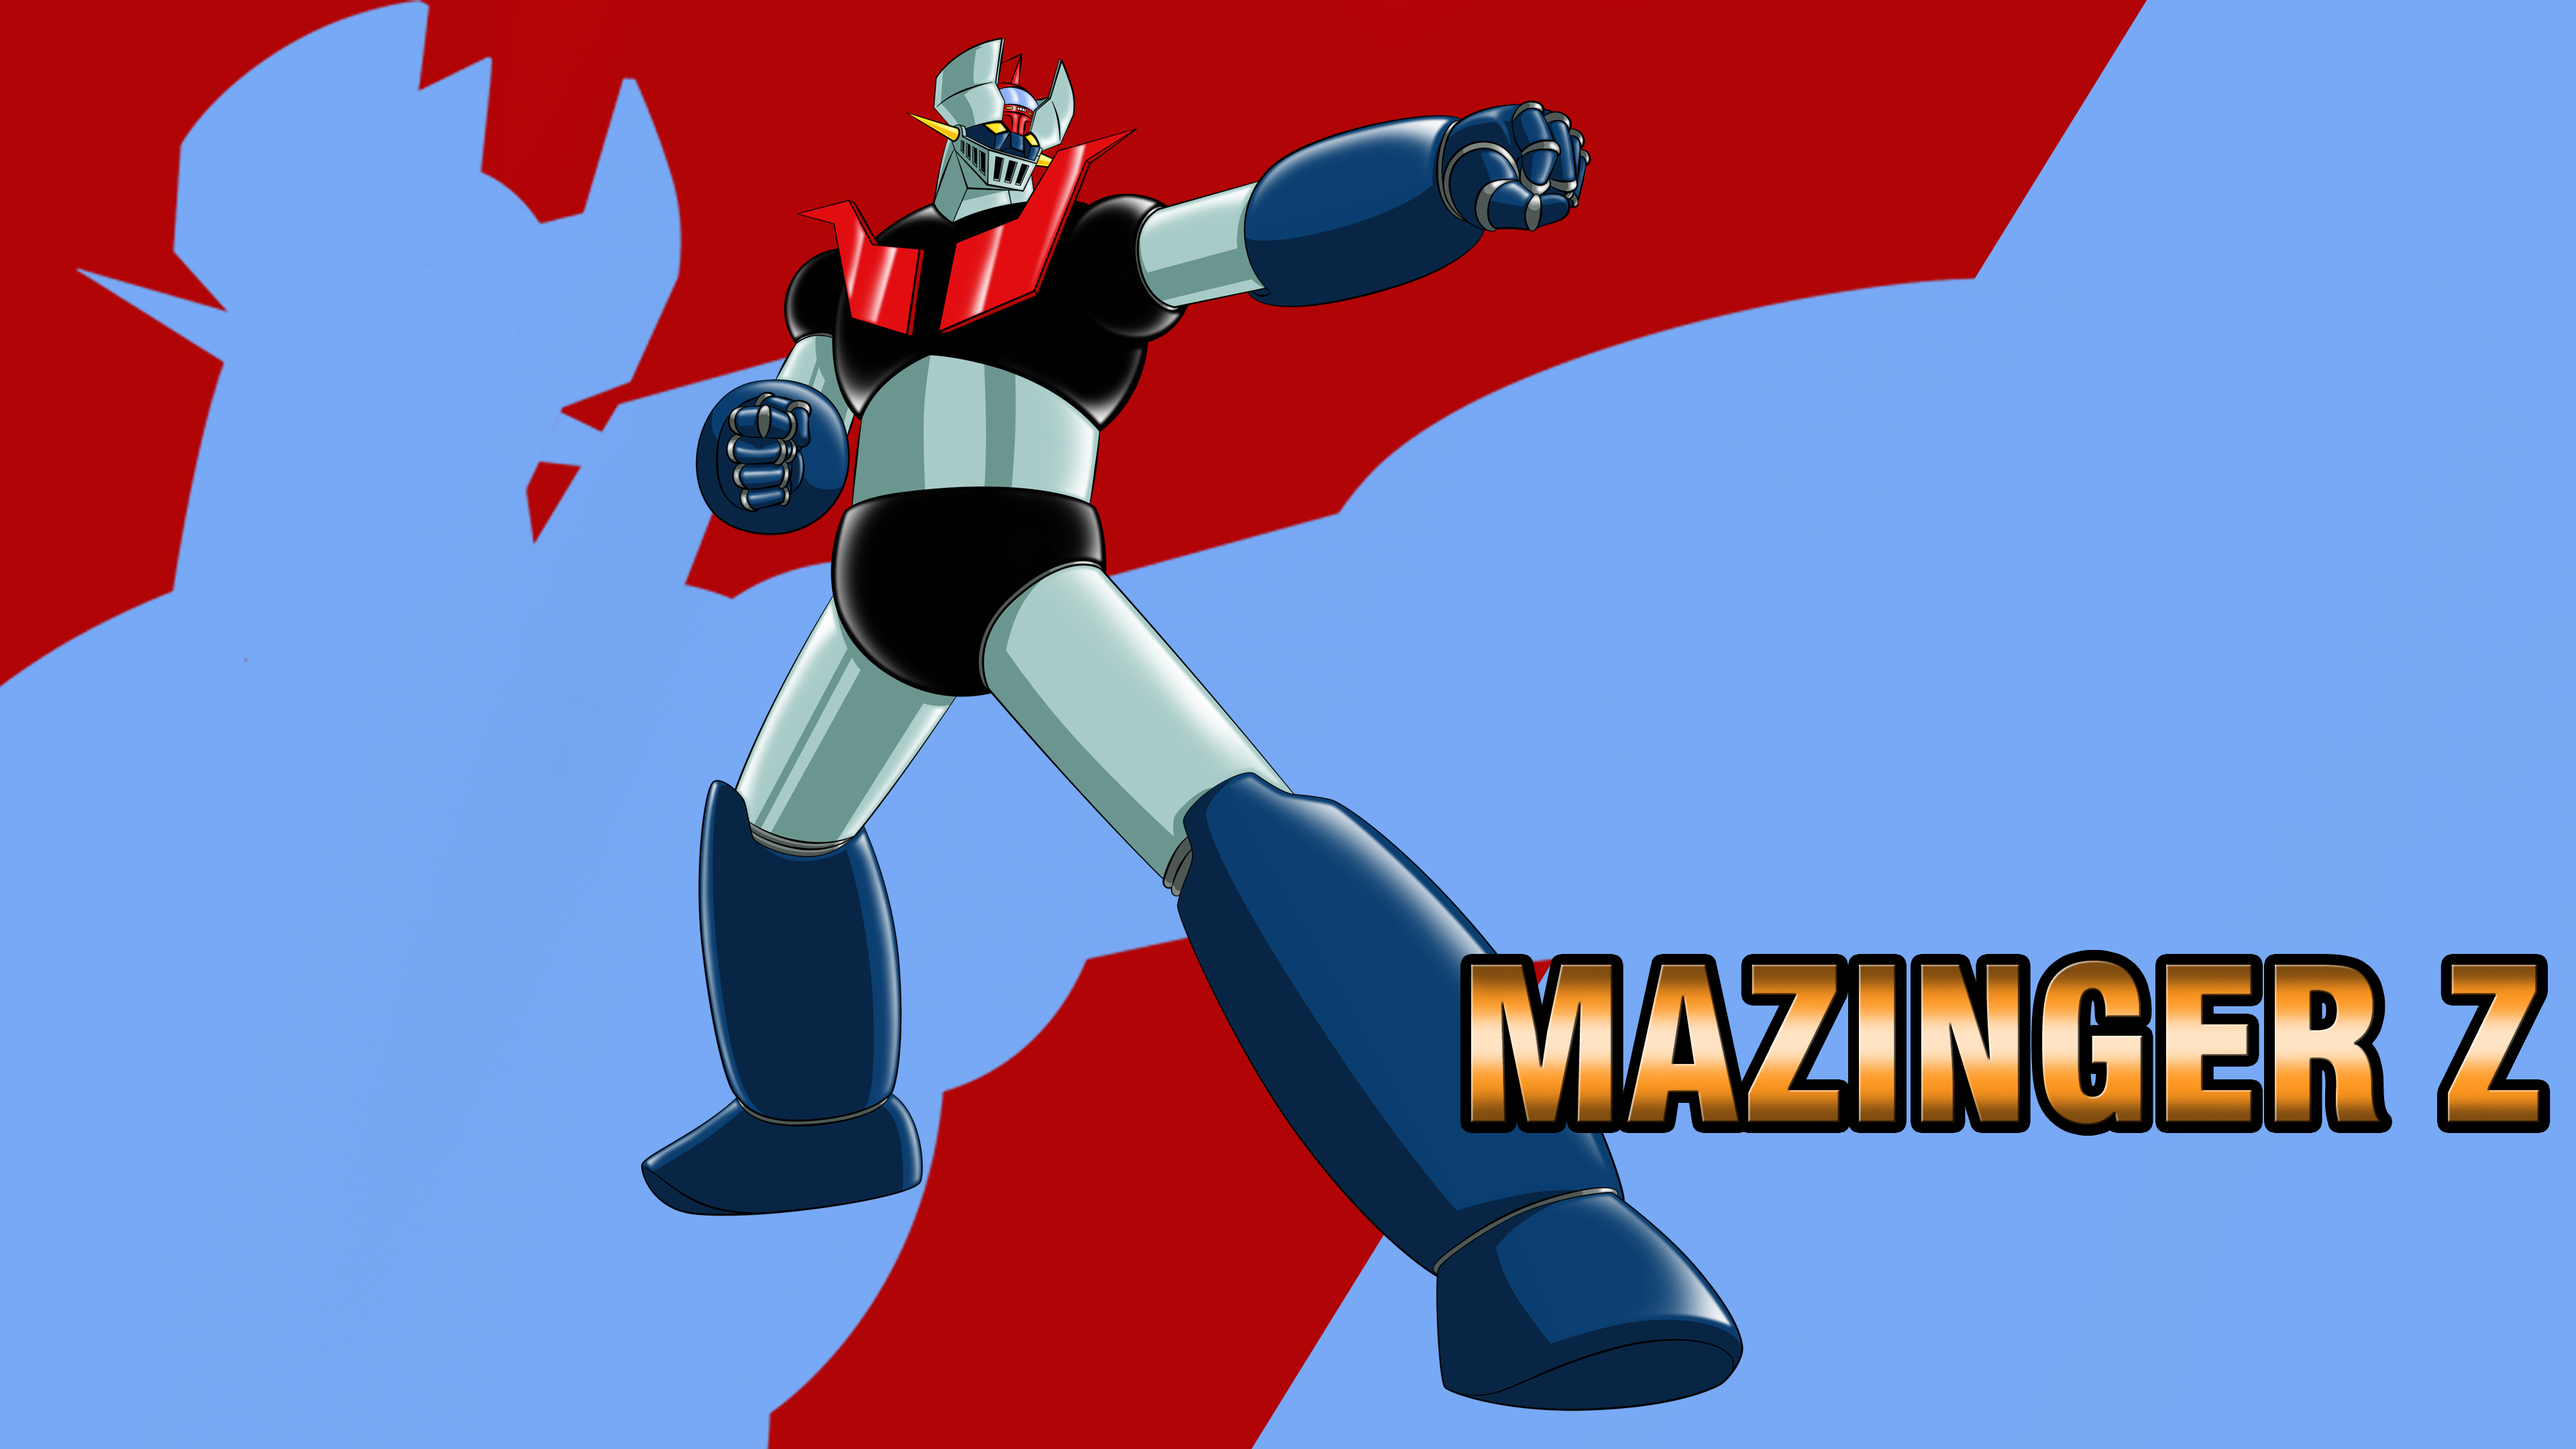 Mazinger z rencontre great mazinger